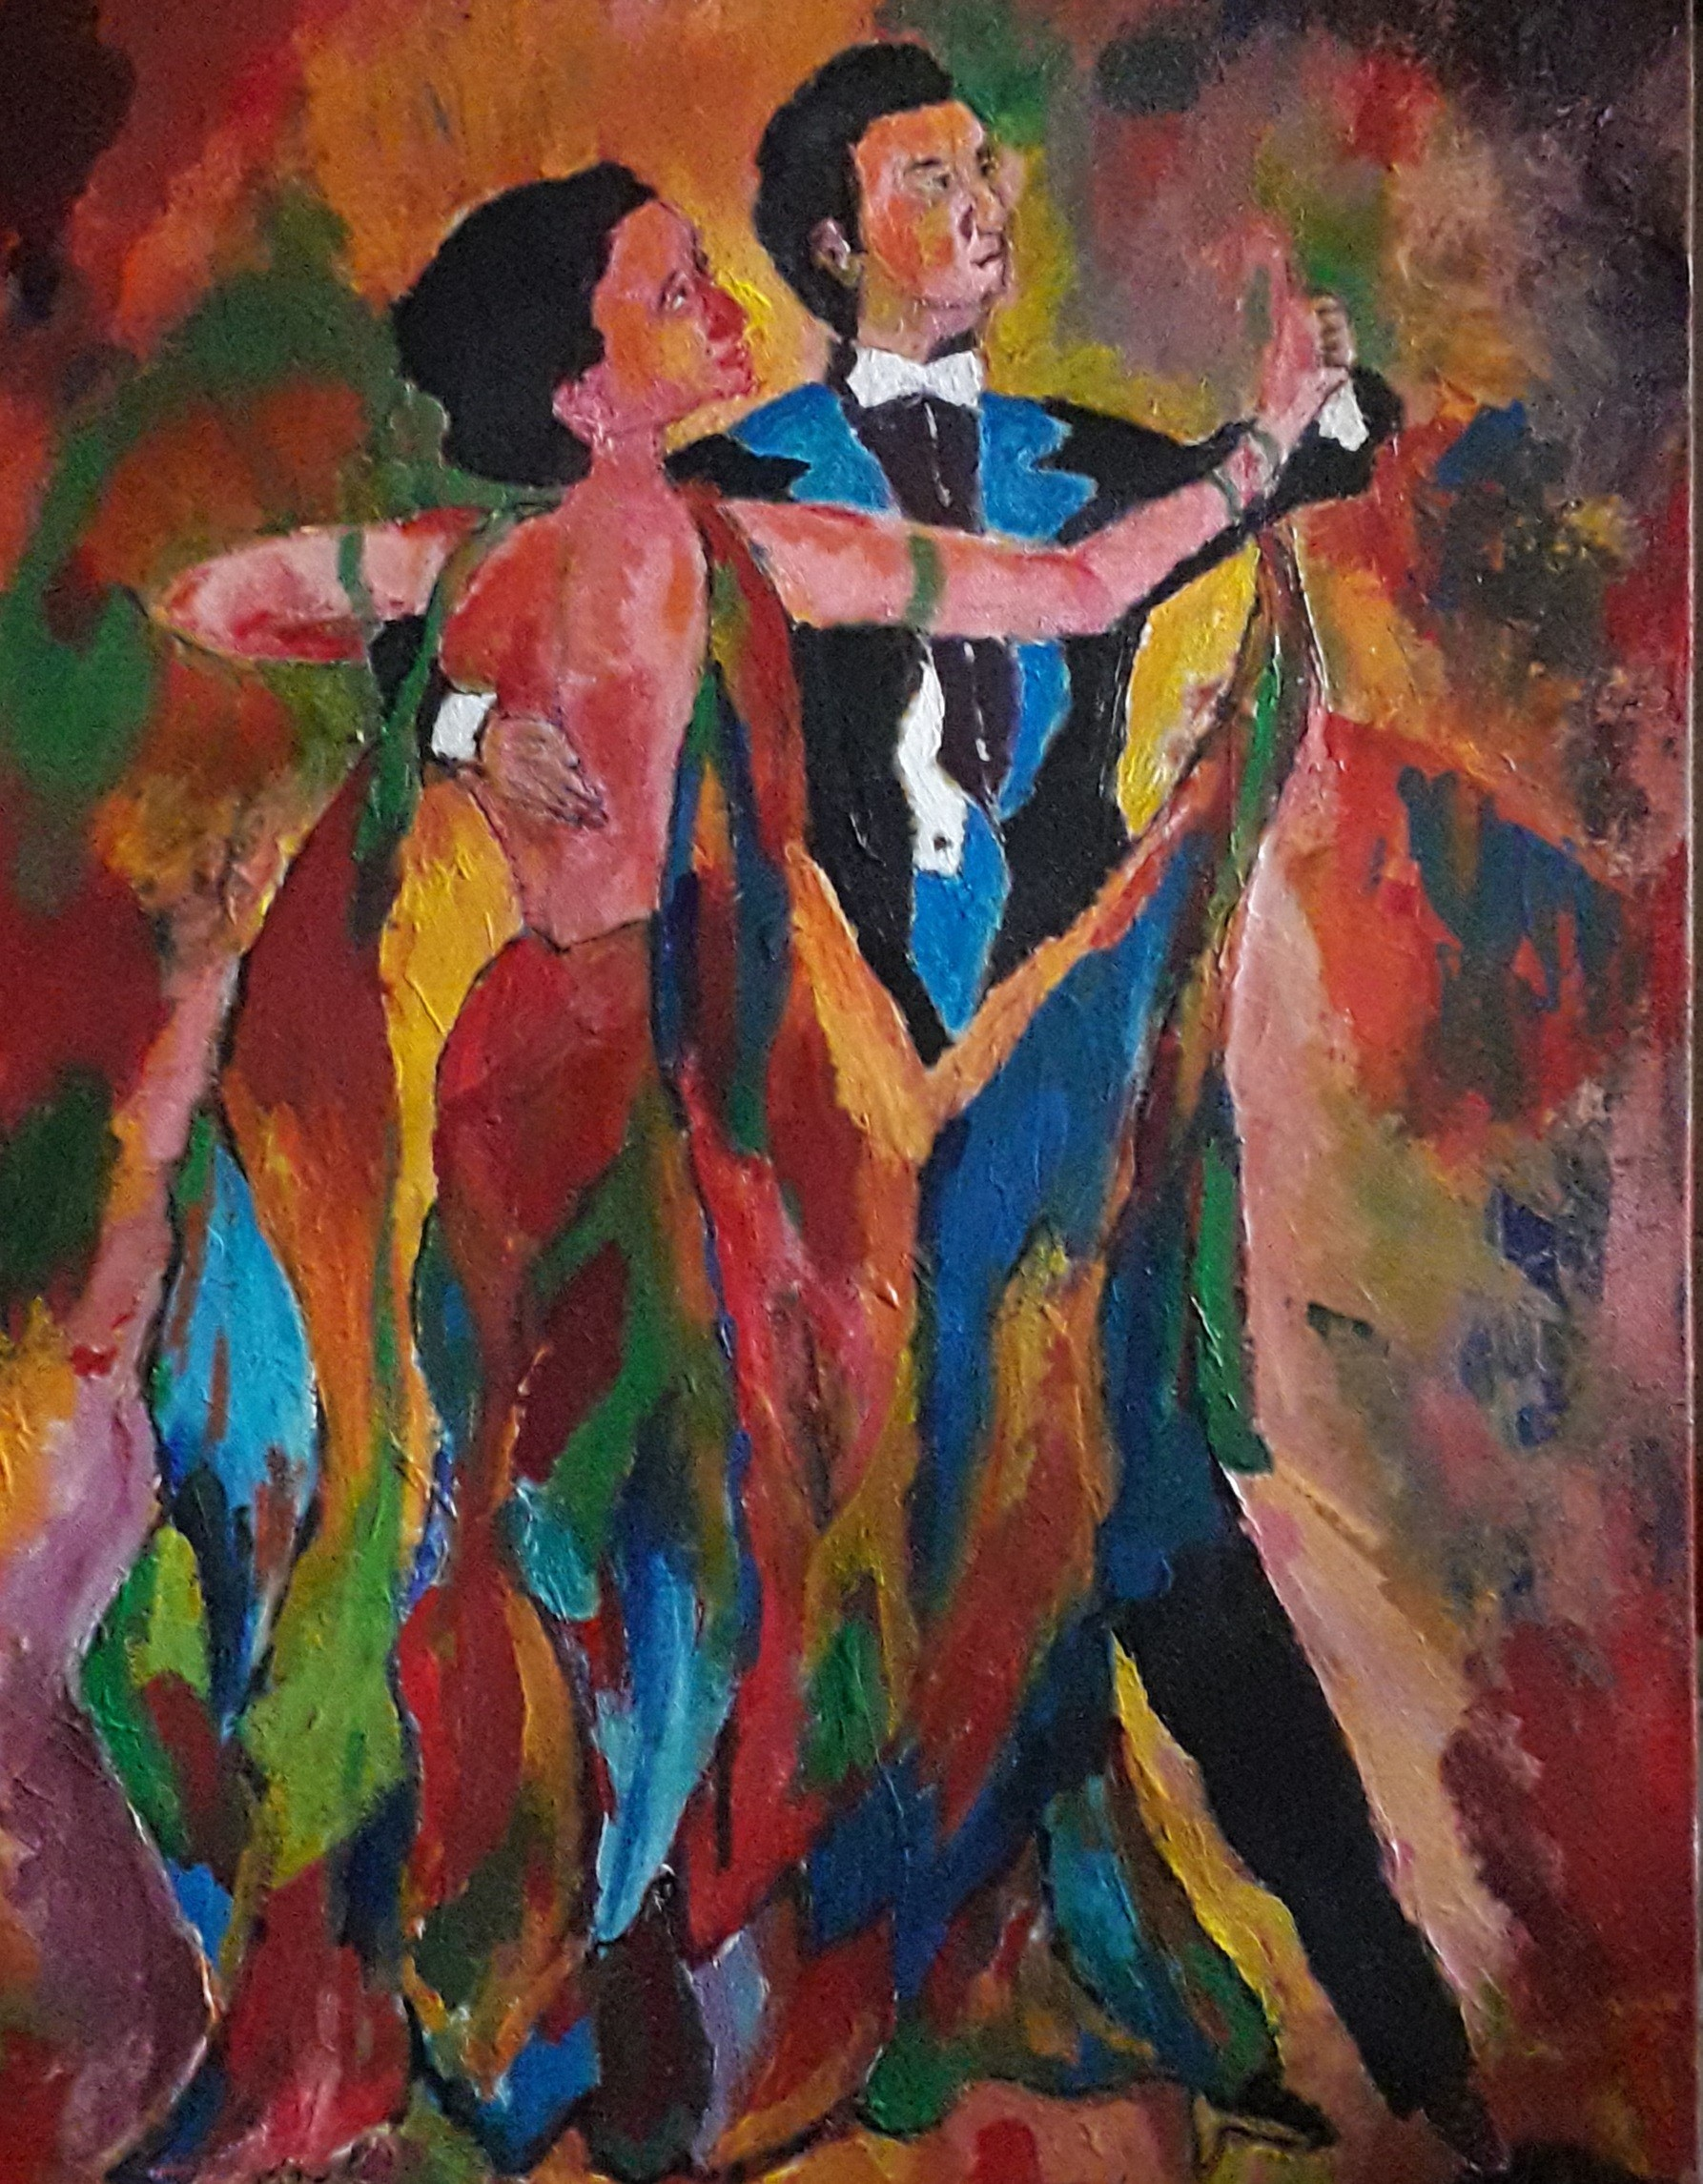 Colorful - Waltzing Matilda by Simpson David